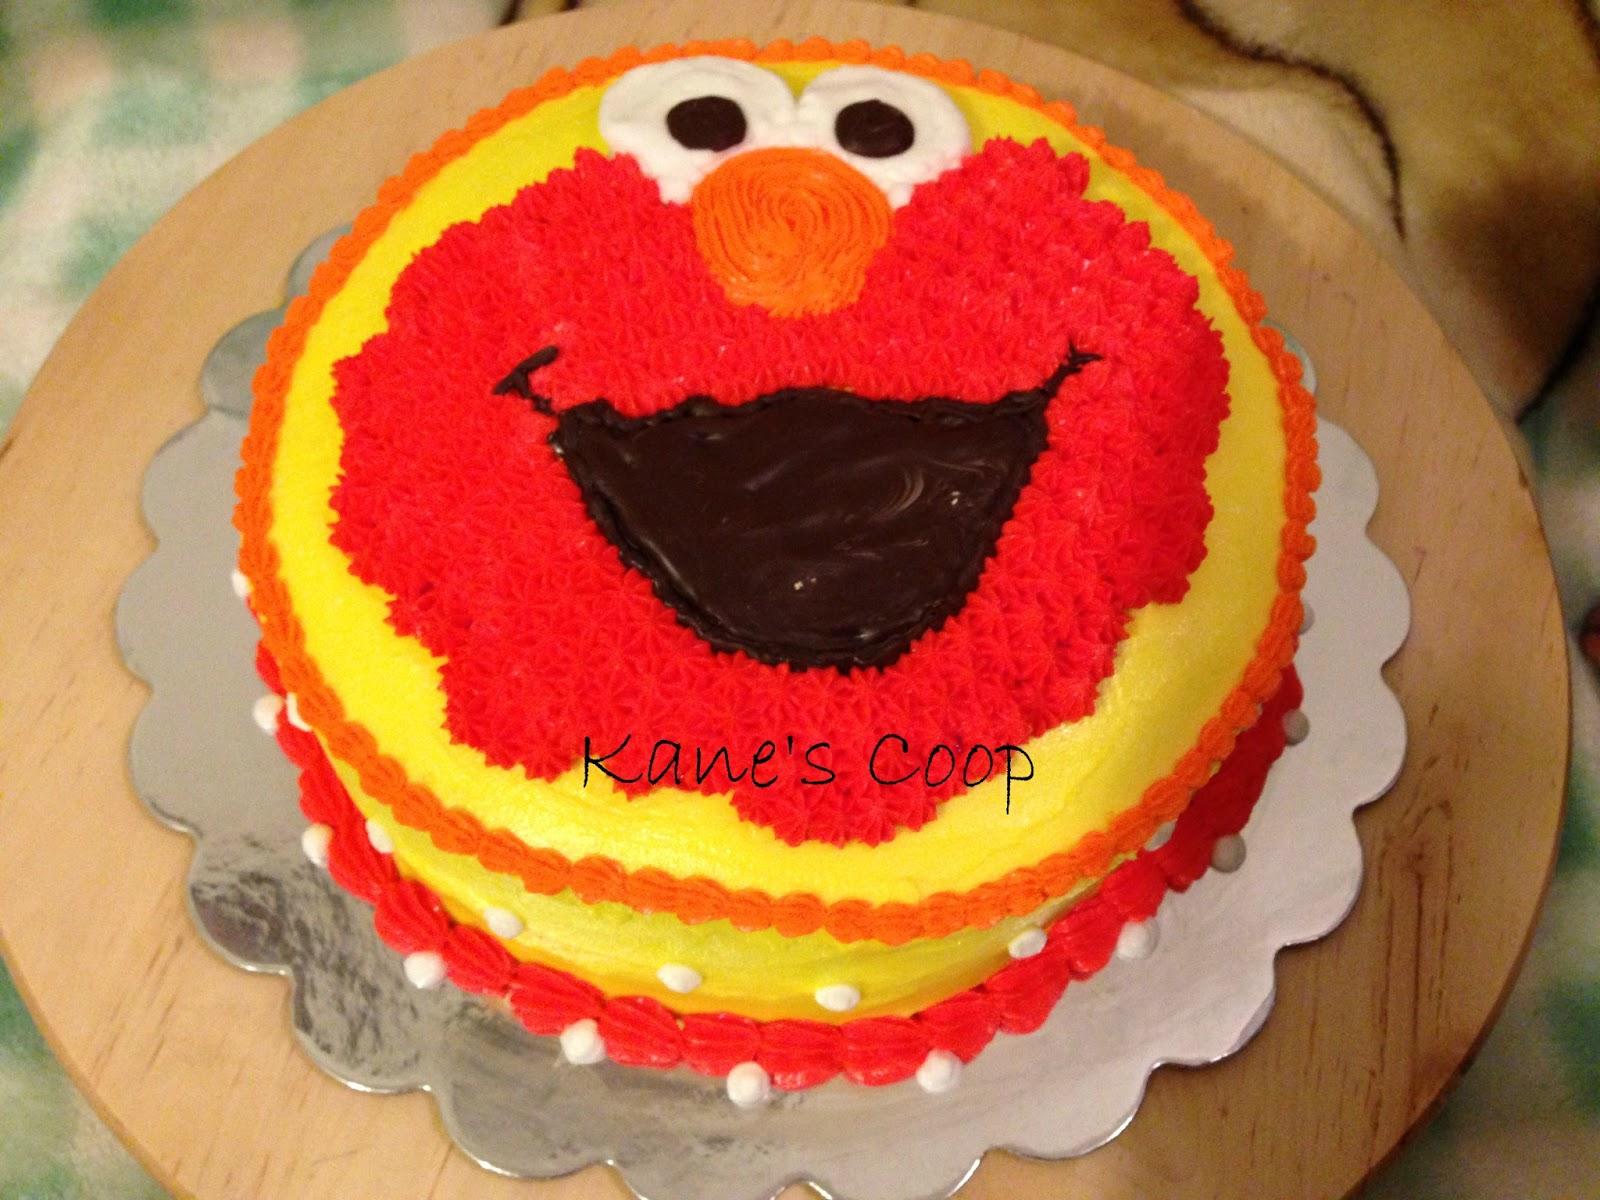 Kanescoop Elmo Cake For Sophias 1st Birthday